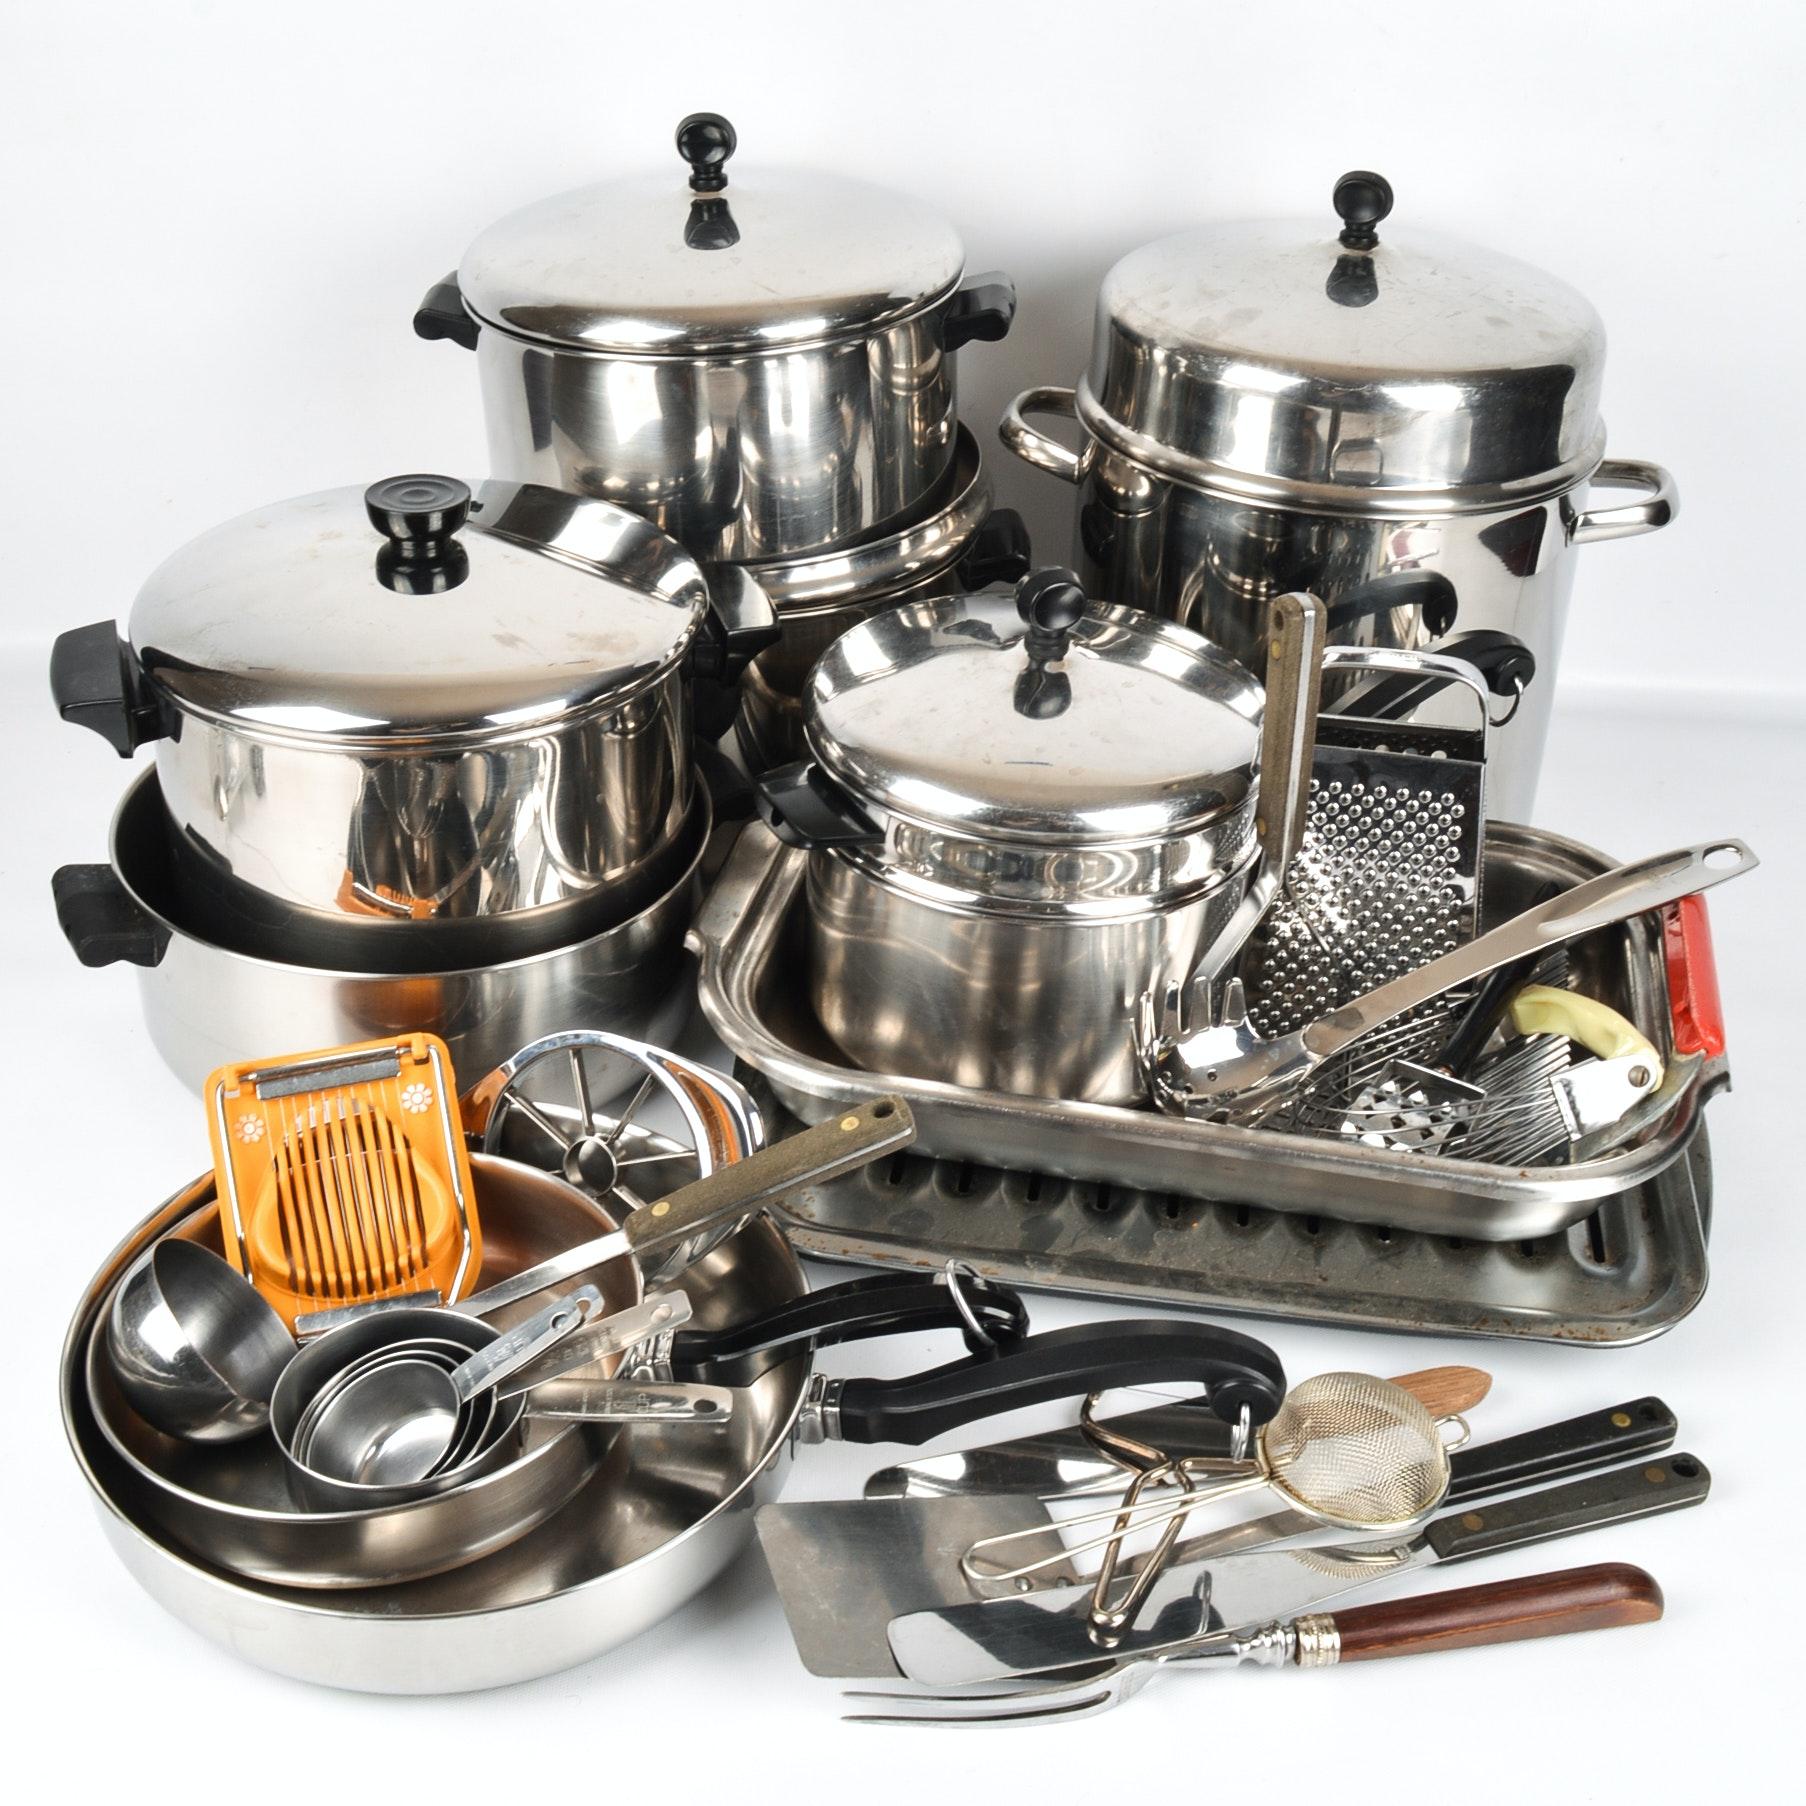 Farberware Cookware and Bakeware Assortment